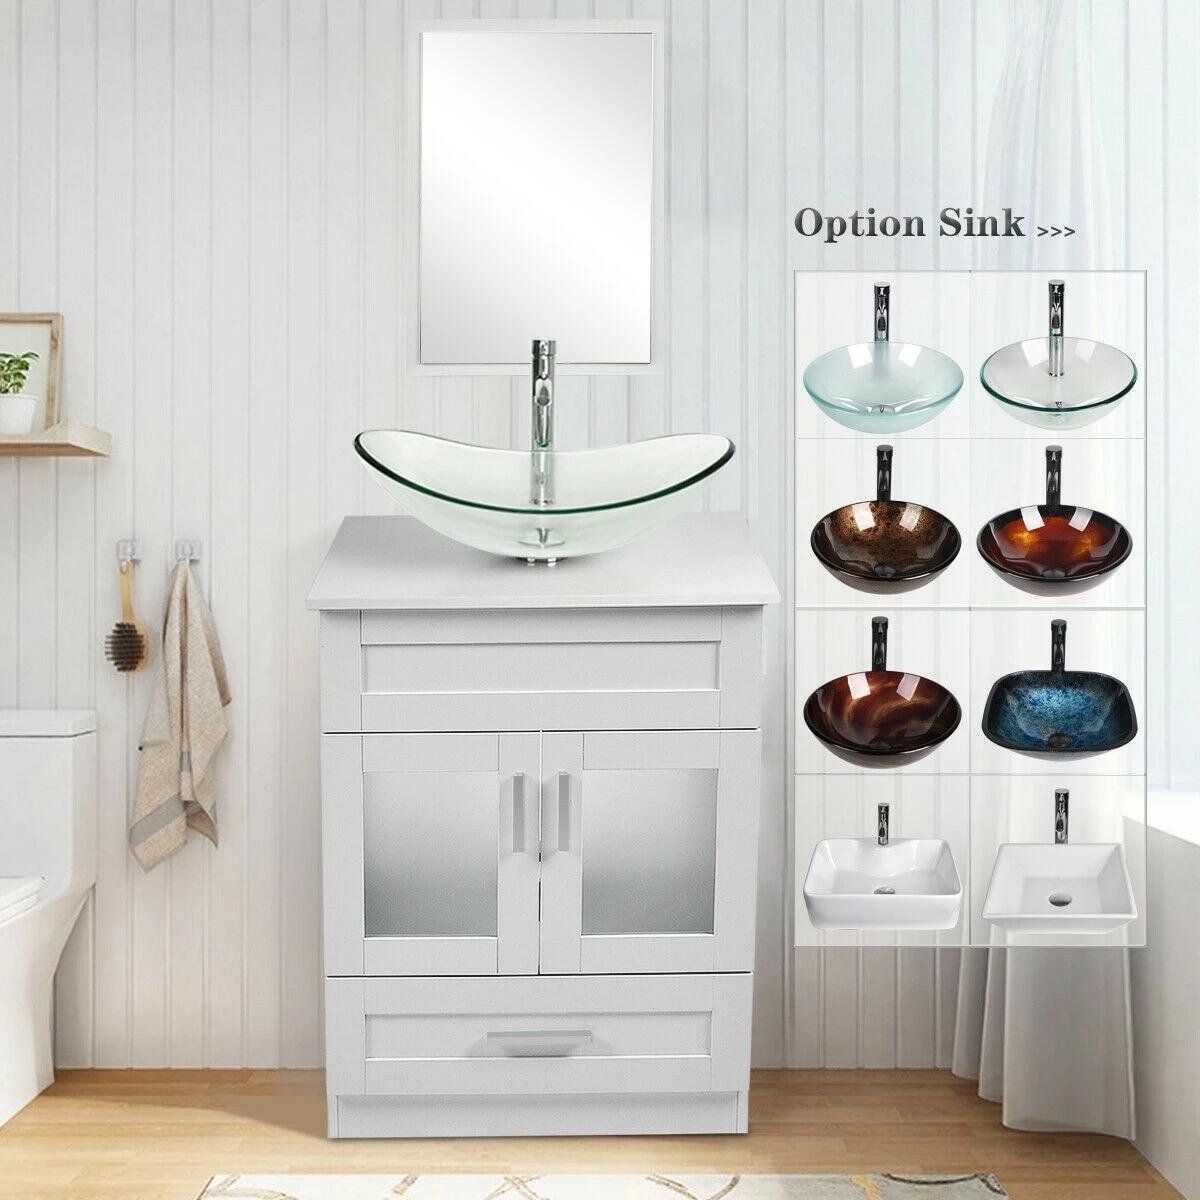 bathroom vanity 24 inch white cabinet single top vessel sink faucet drain combo set